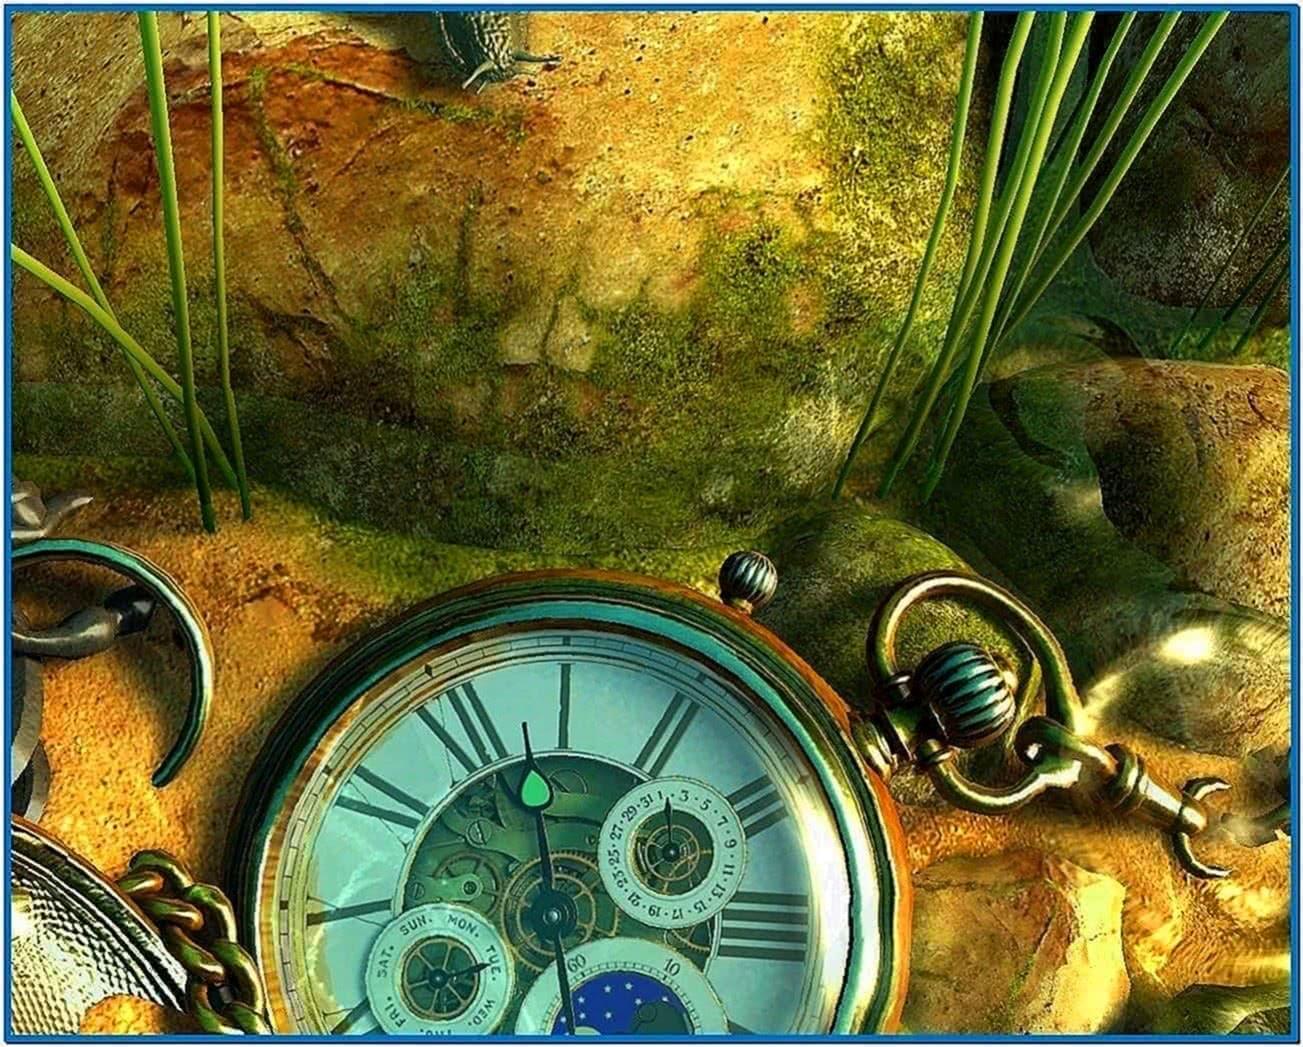 The Lost Watch II 3D Screensaver 1.0.0.3